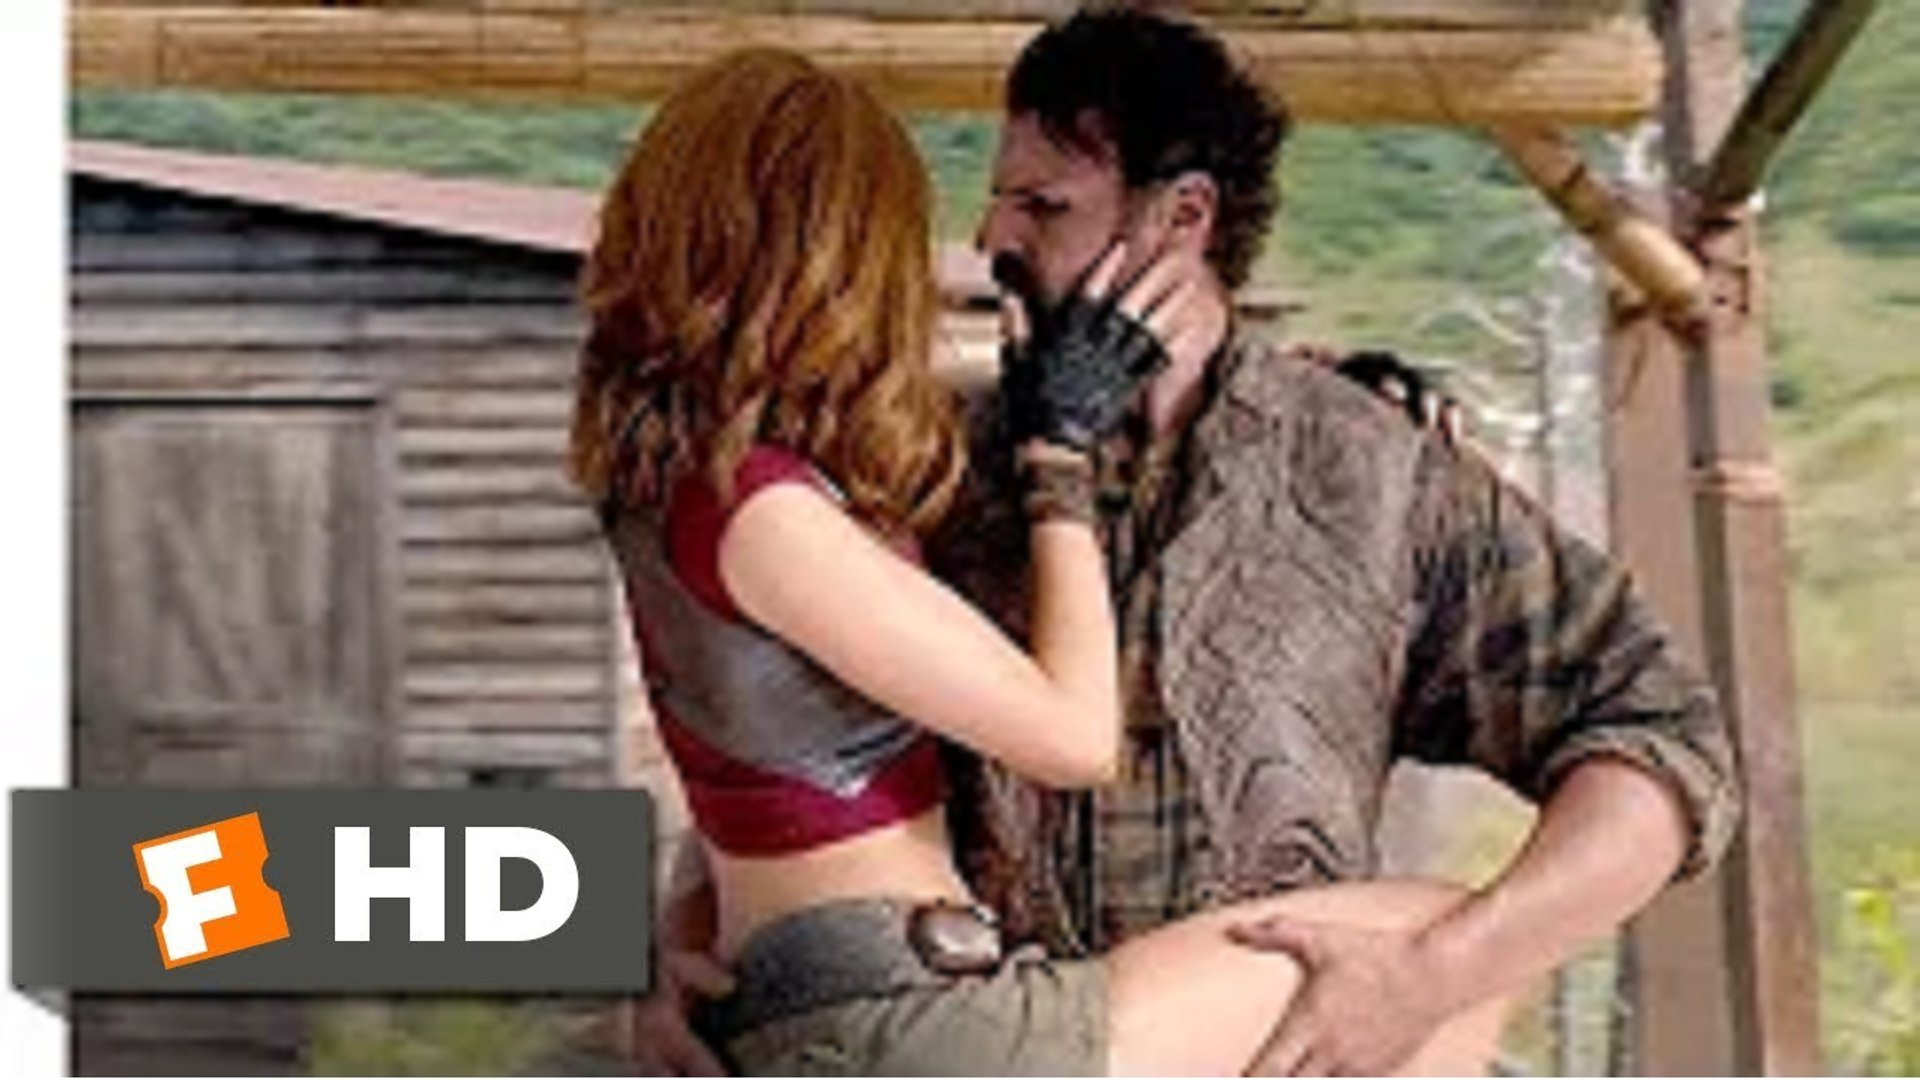 Jumanji 2 - Welcome to the Jungle (2017) Dance Fighting Scene (5-10) - Hollywood Movies English full